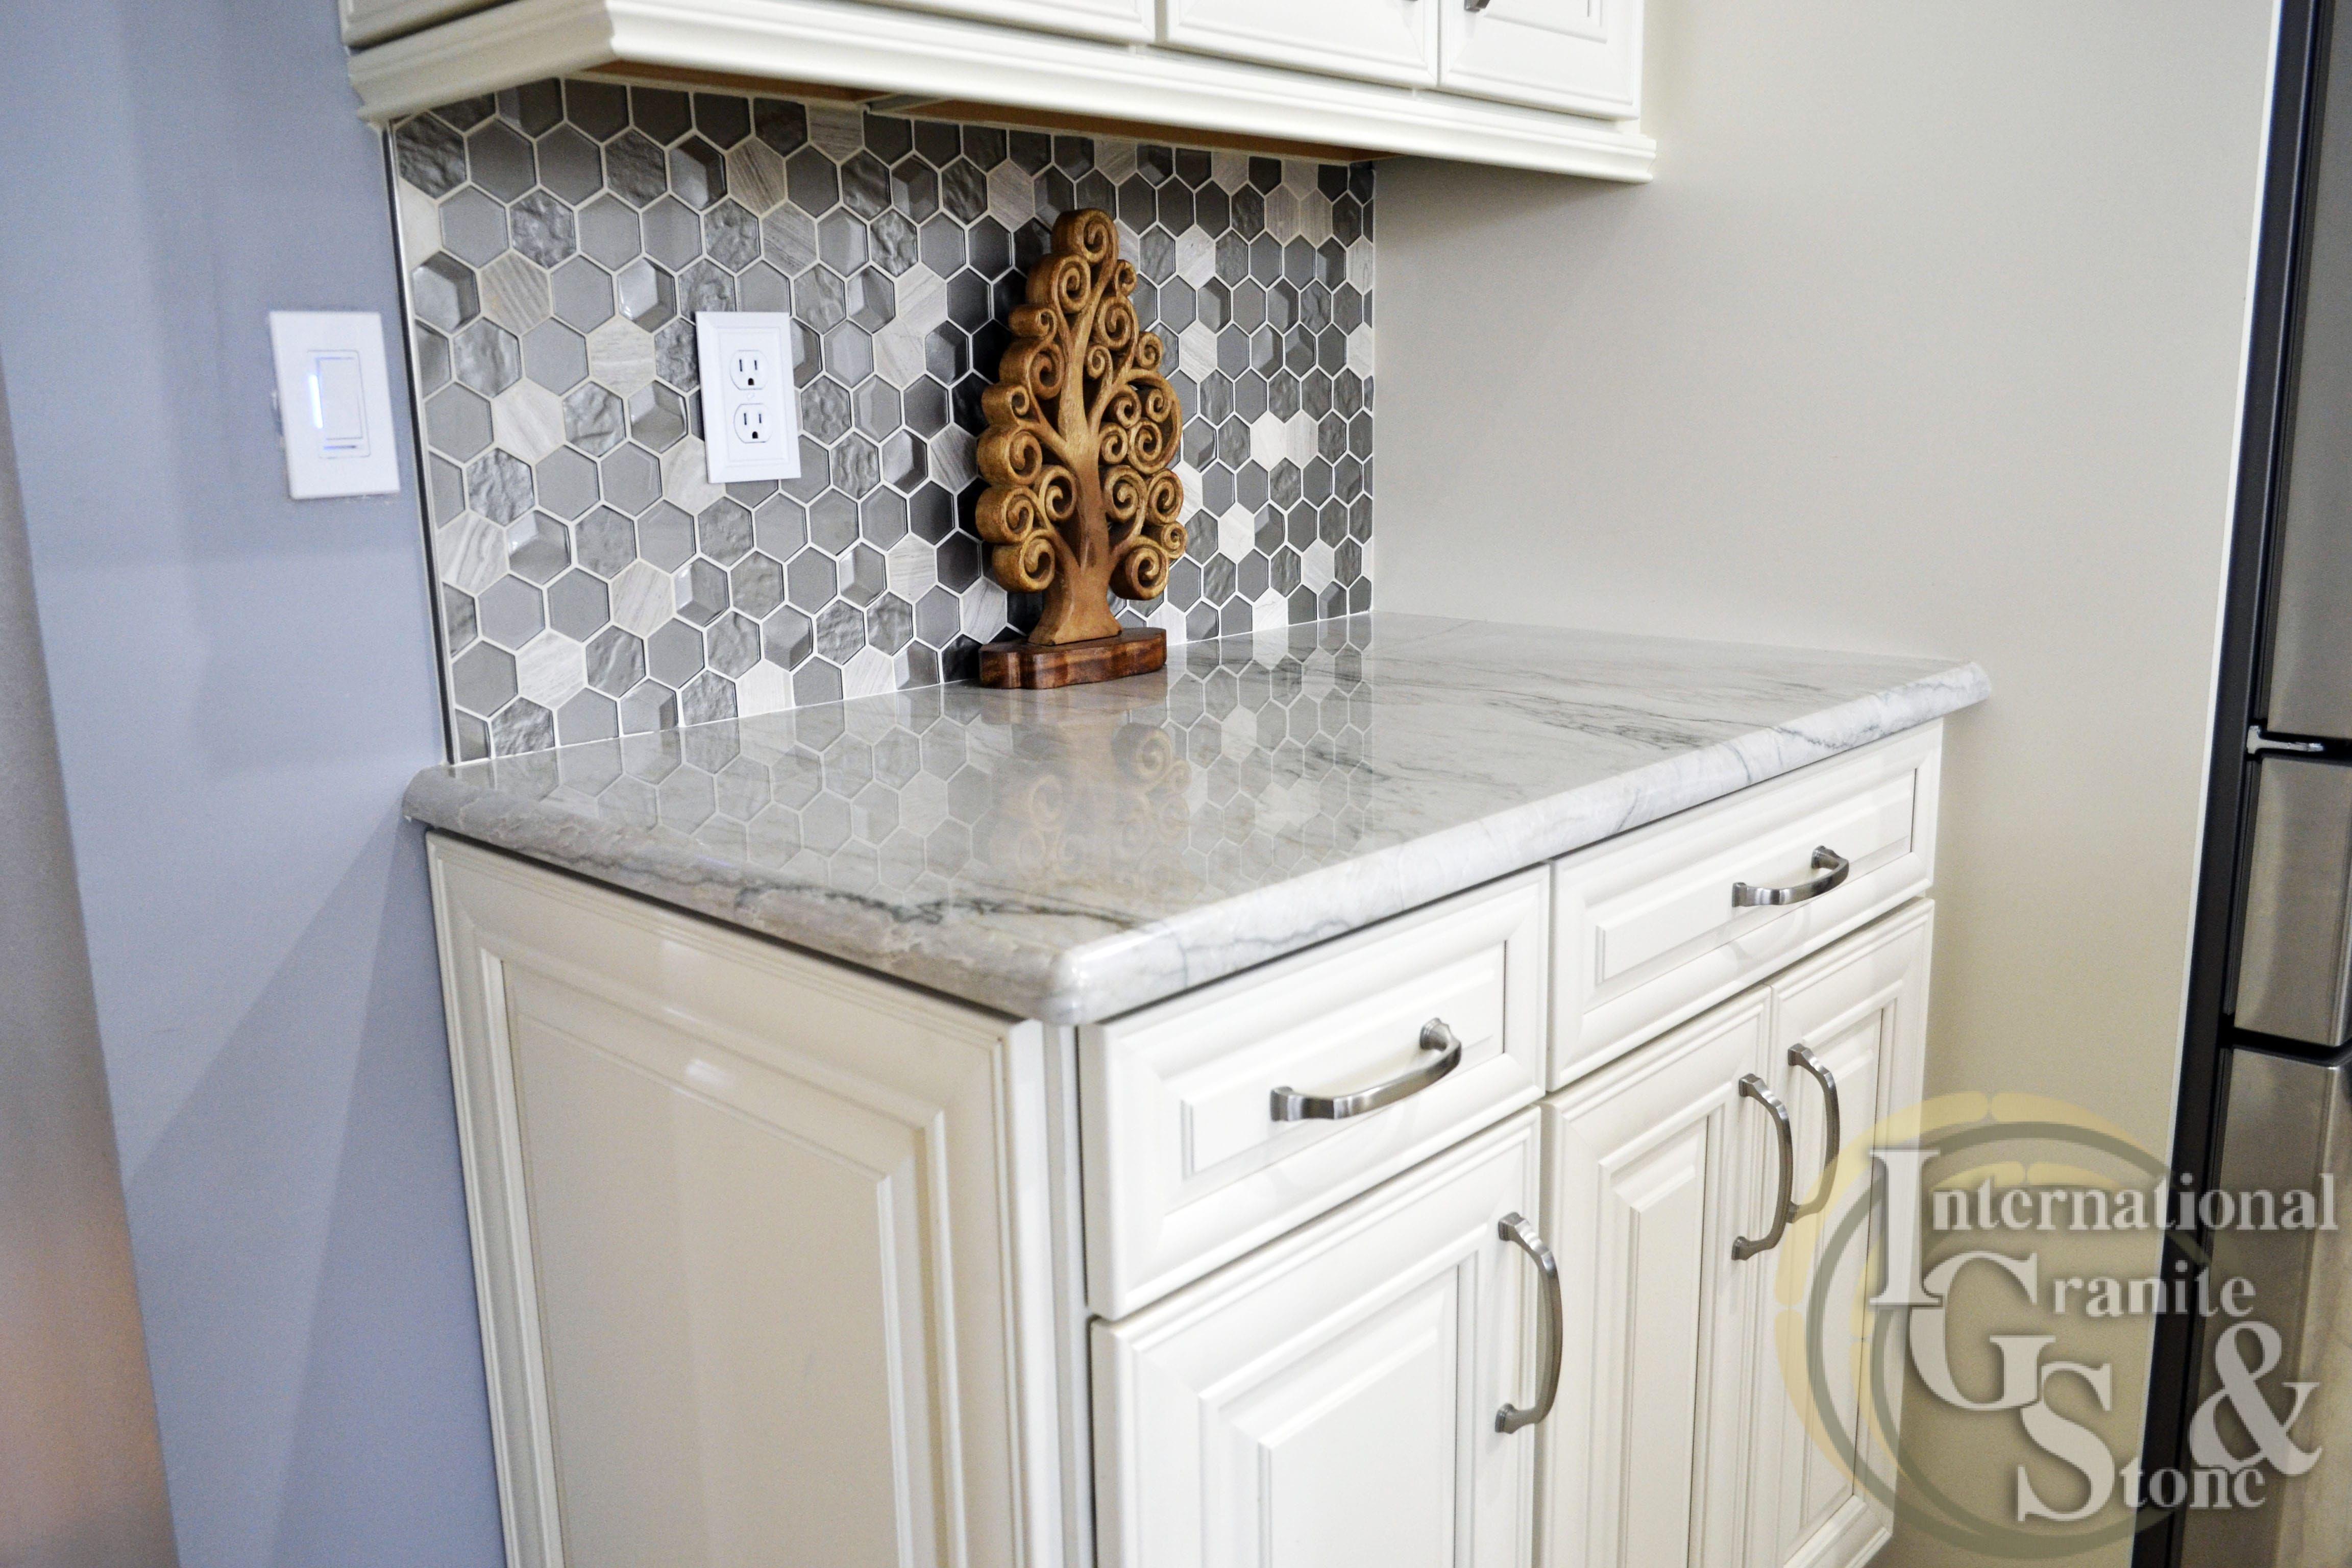 Check out this Recent Countertop White Quartzite Kitchen Countertop